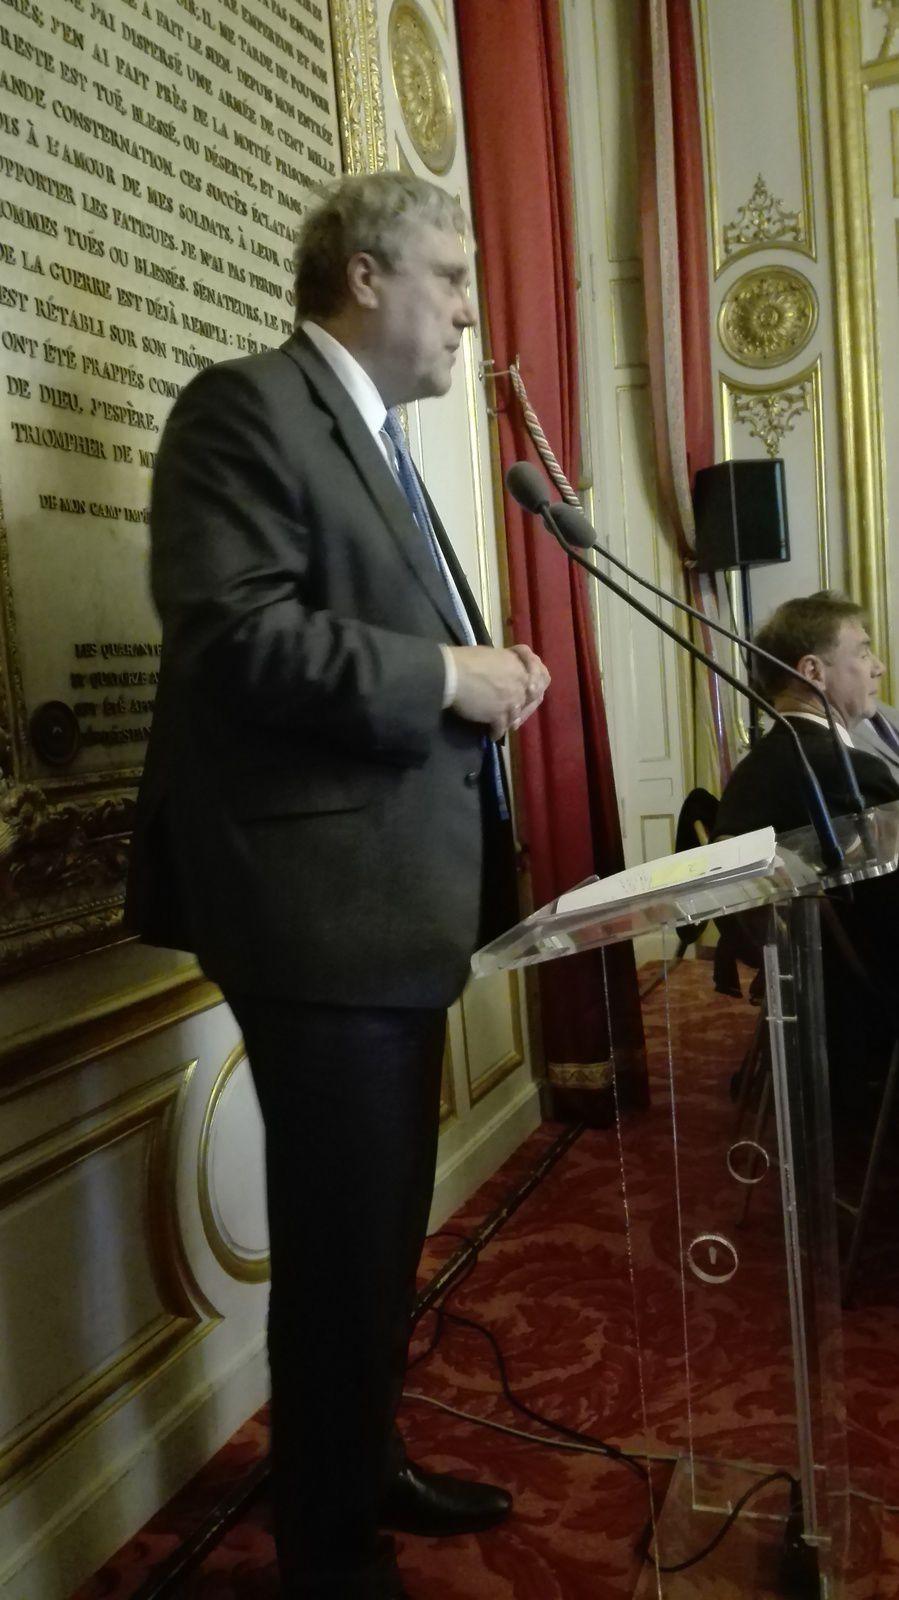 Son Excellence Alar STREIMANN, Ambassadeur d'Estonie en France